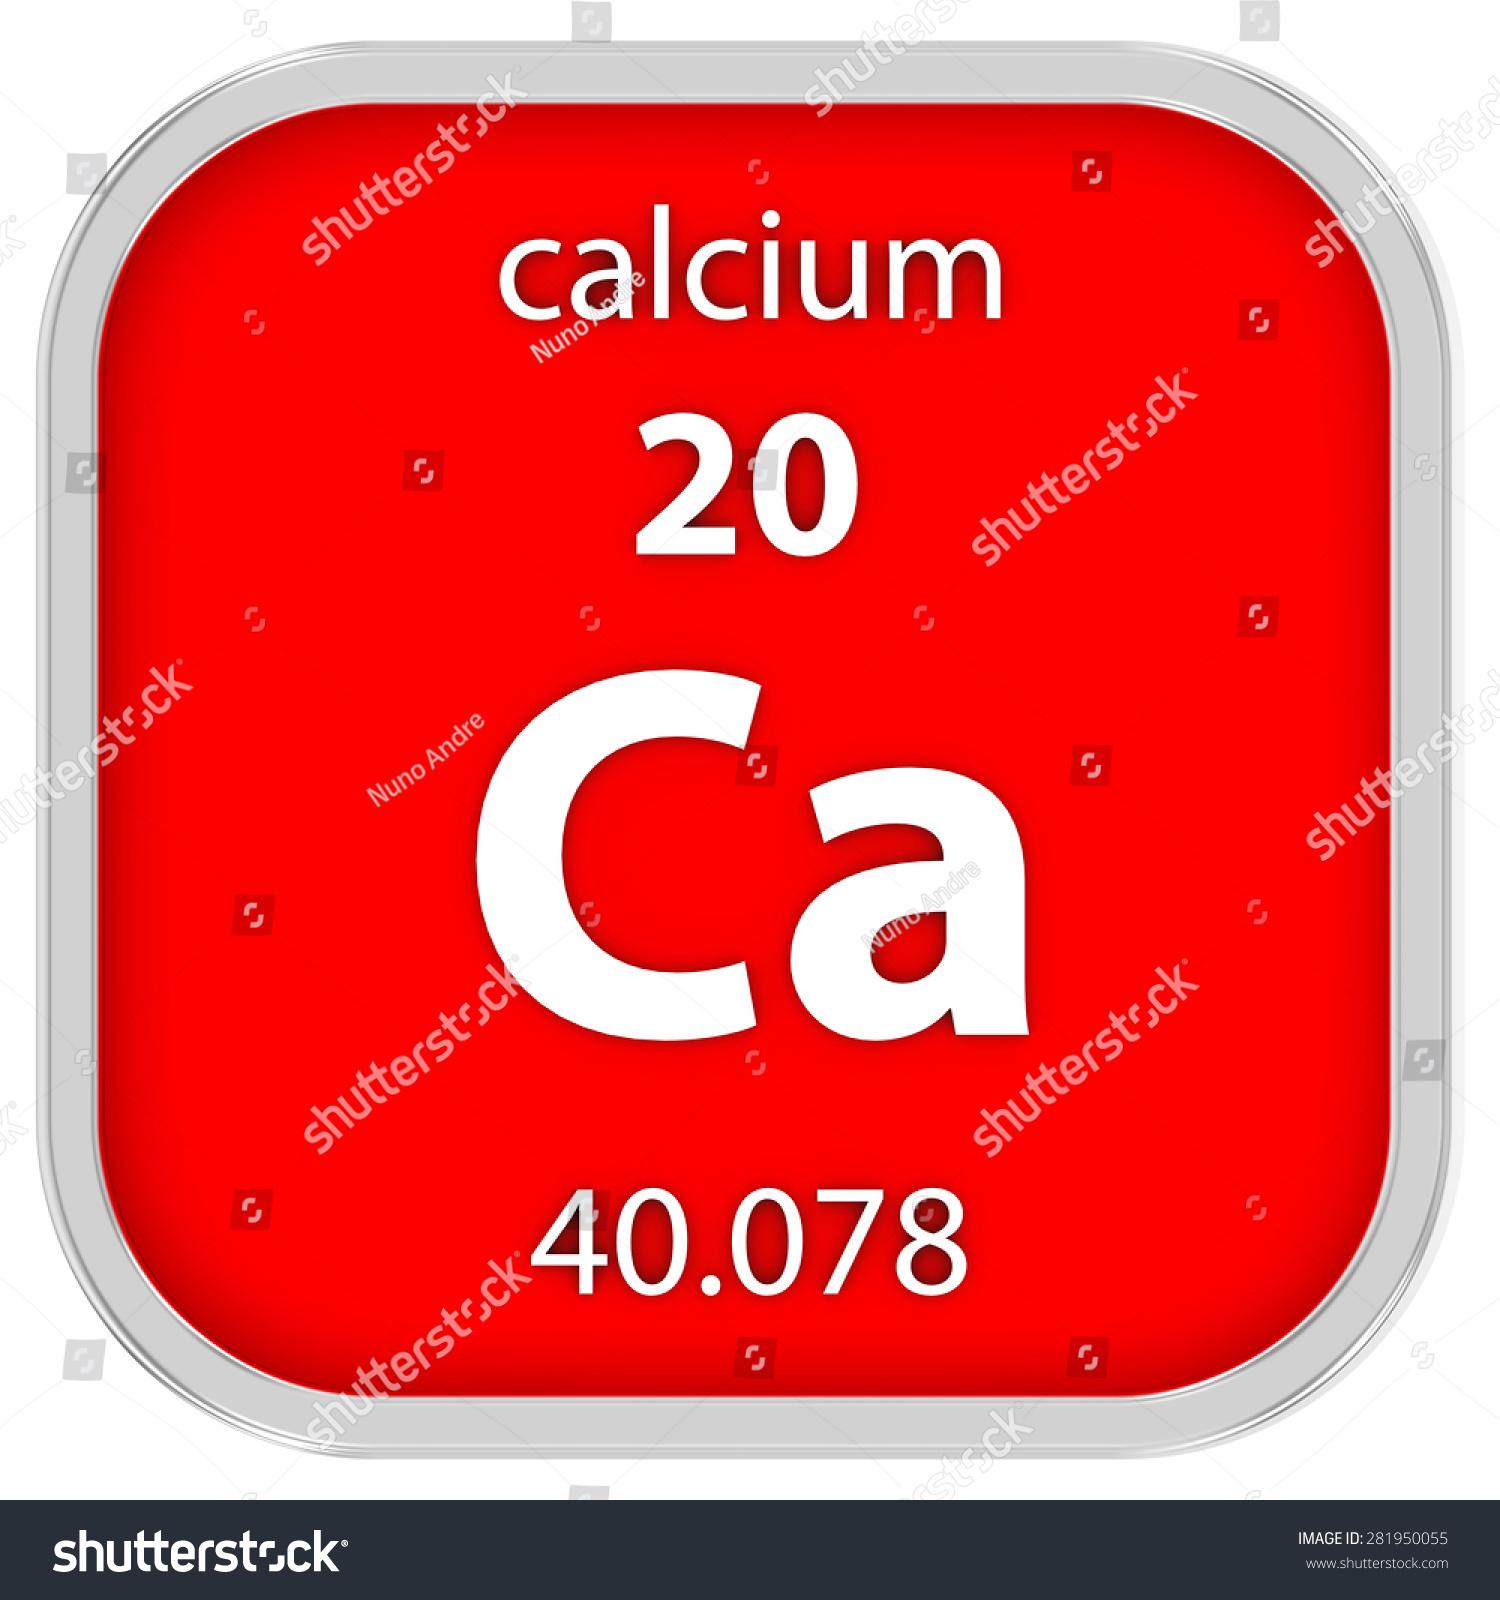 Calcium on periodic table choice image periodic table images calcium material on periodic table part stock illustration calcium material on the periodic table part of gamestrikefo Images